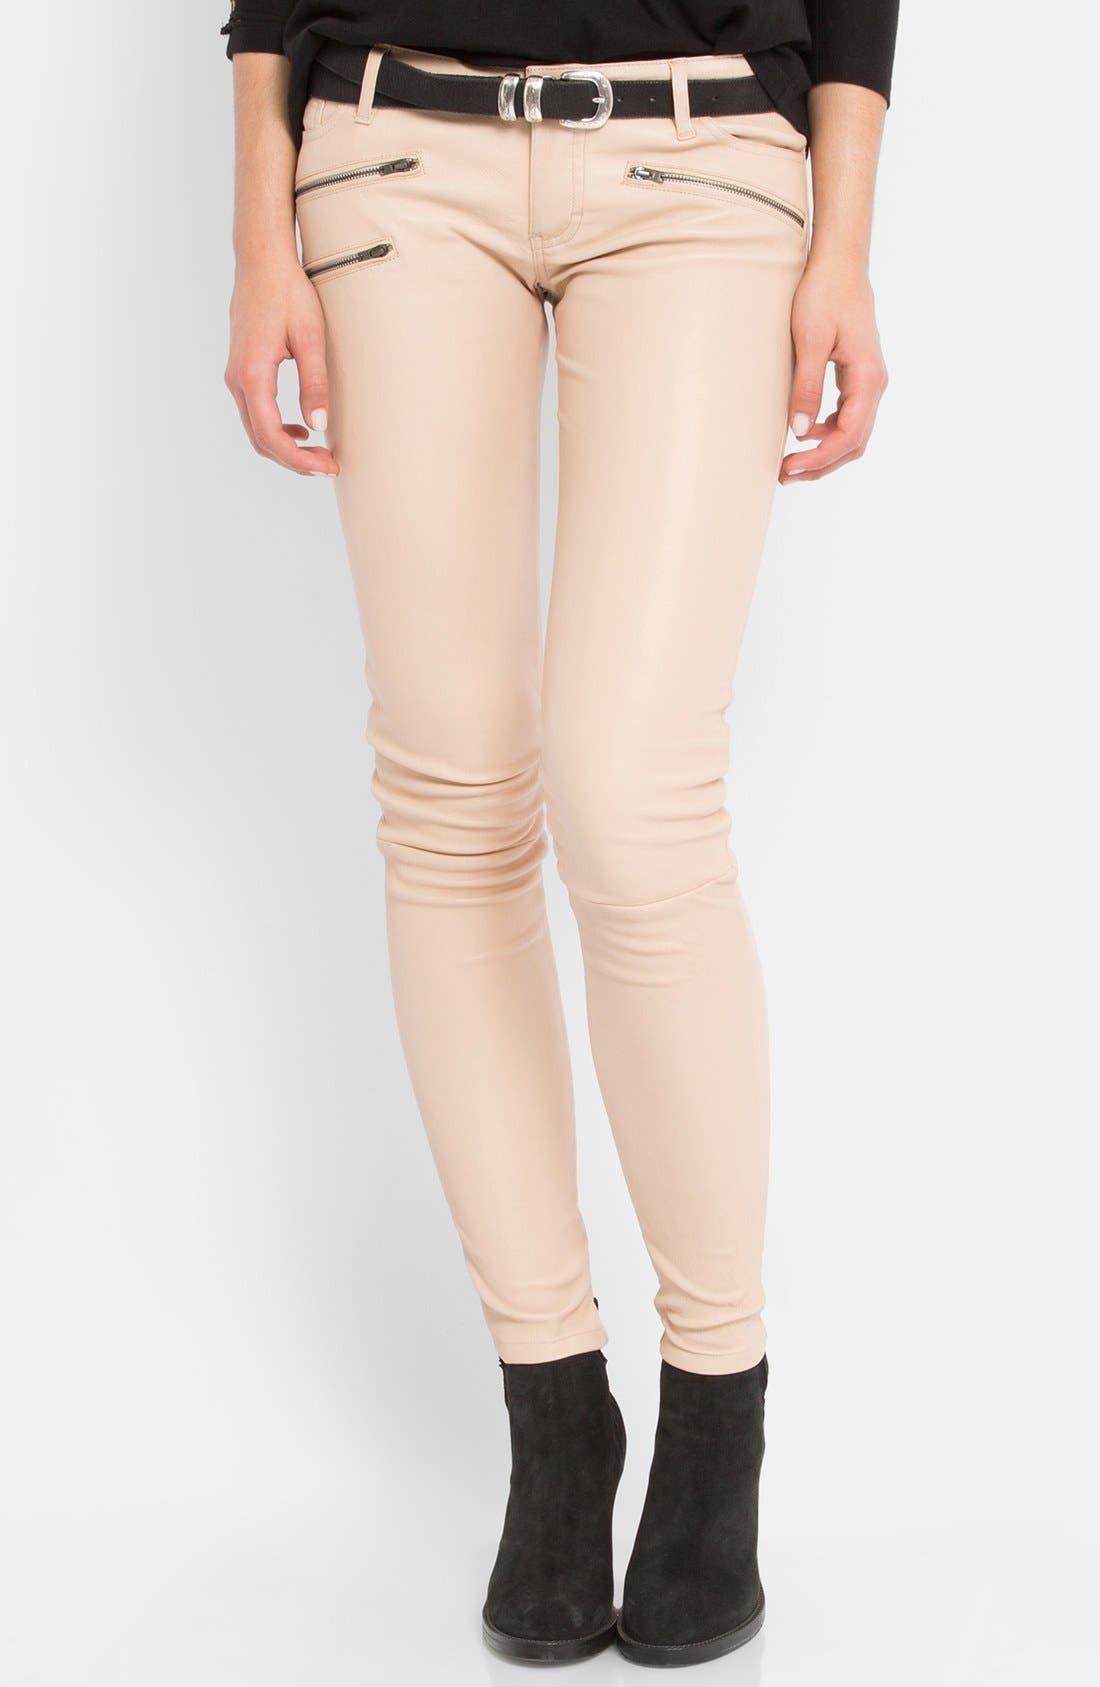 Alternate Image 1 Selected - maje 'Daft' Leather Pants